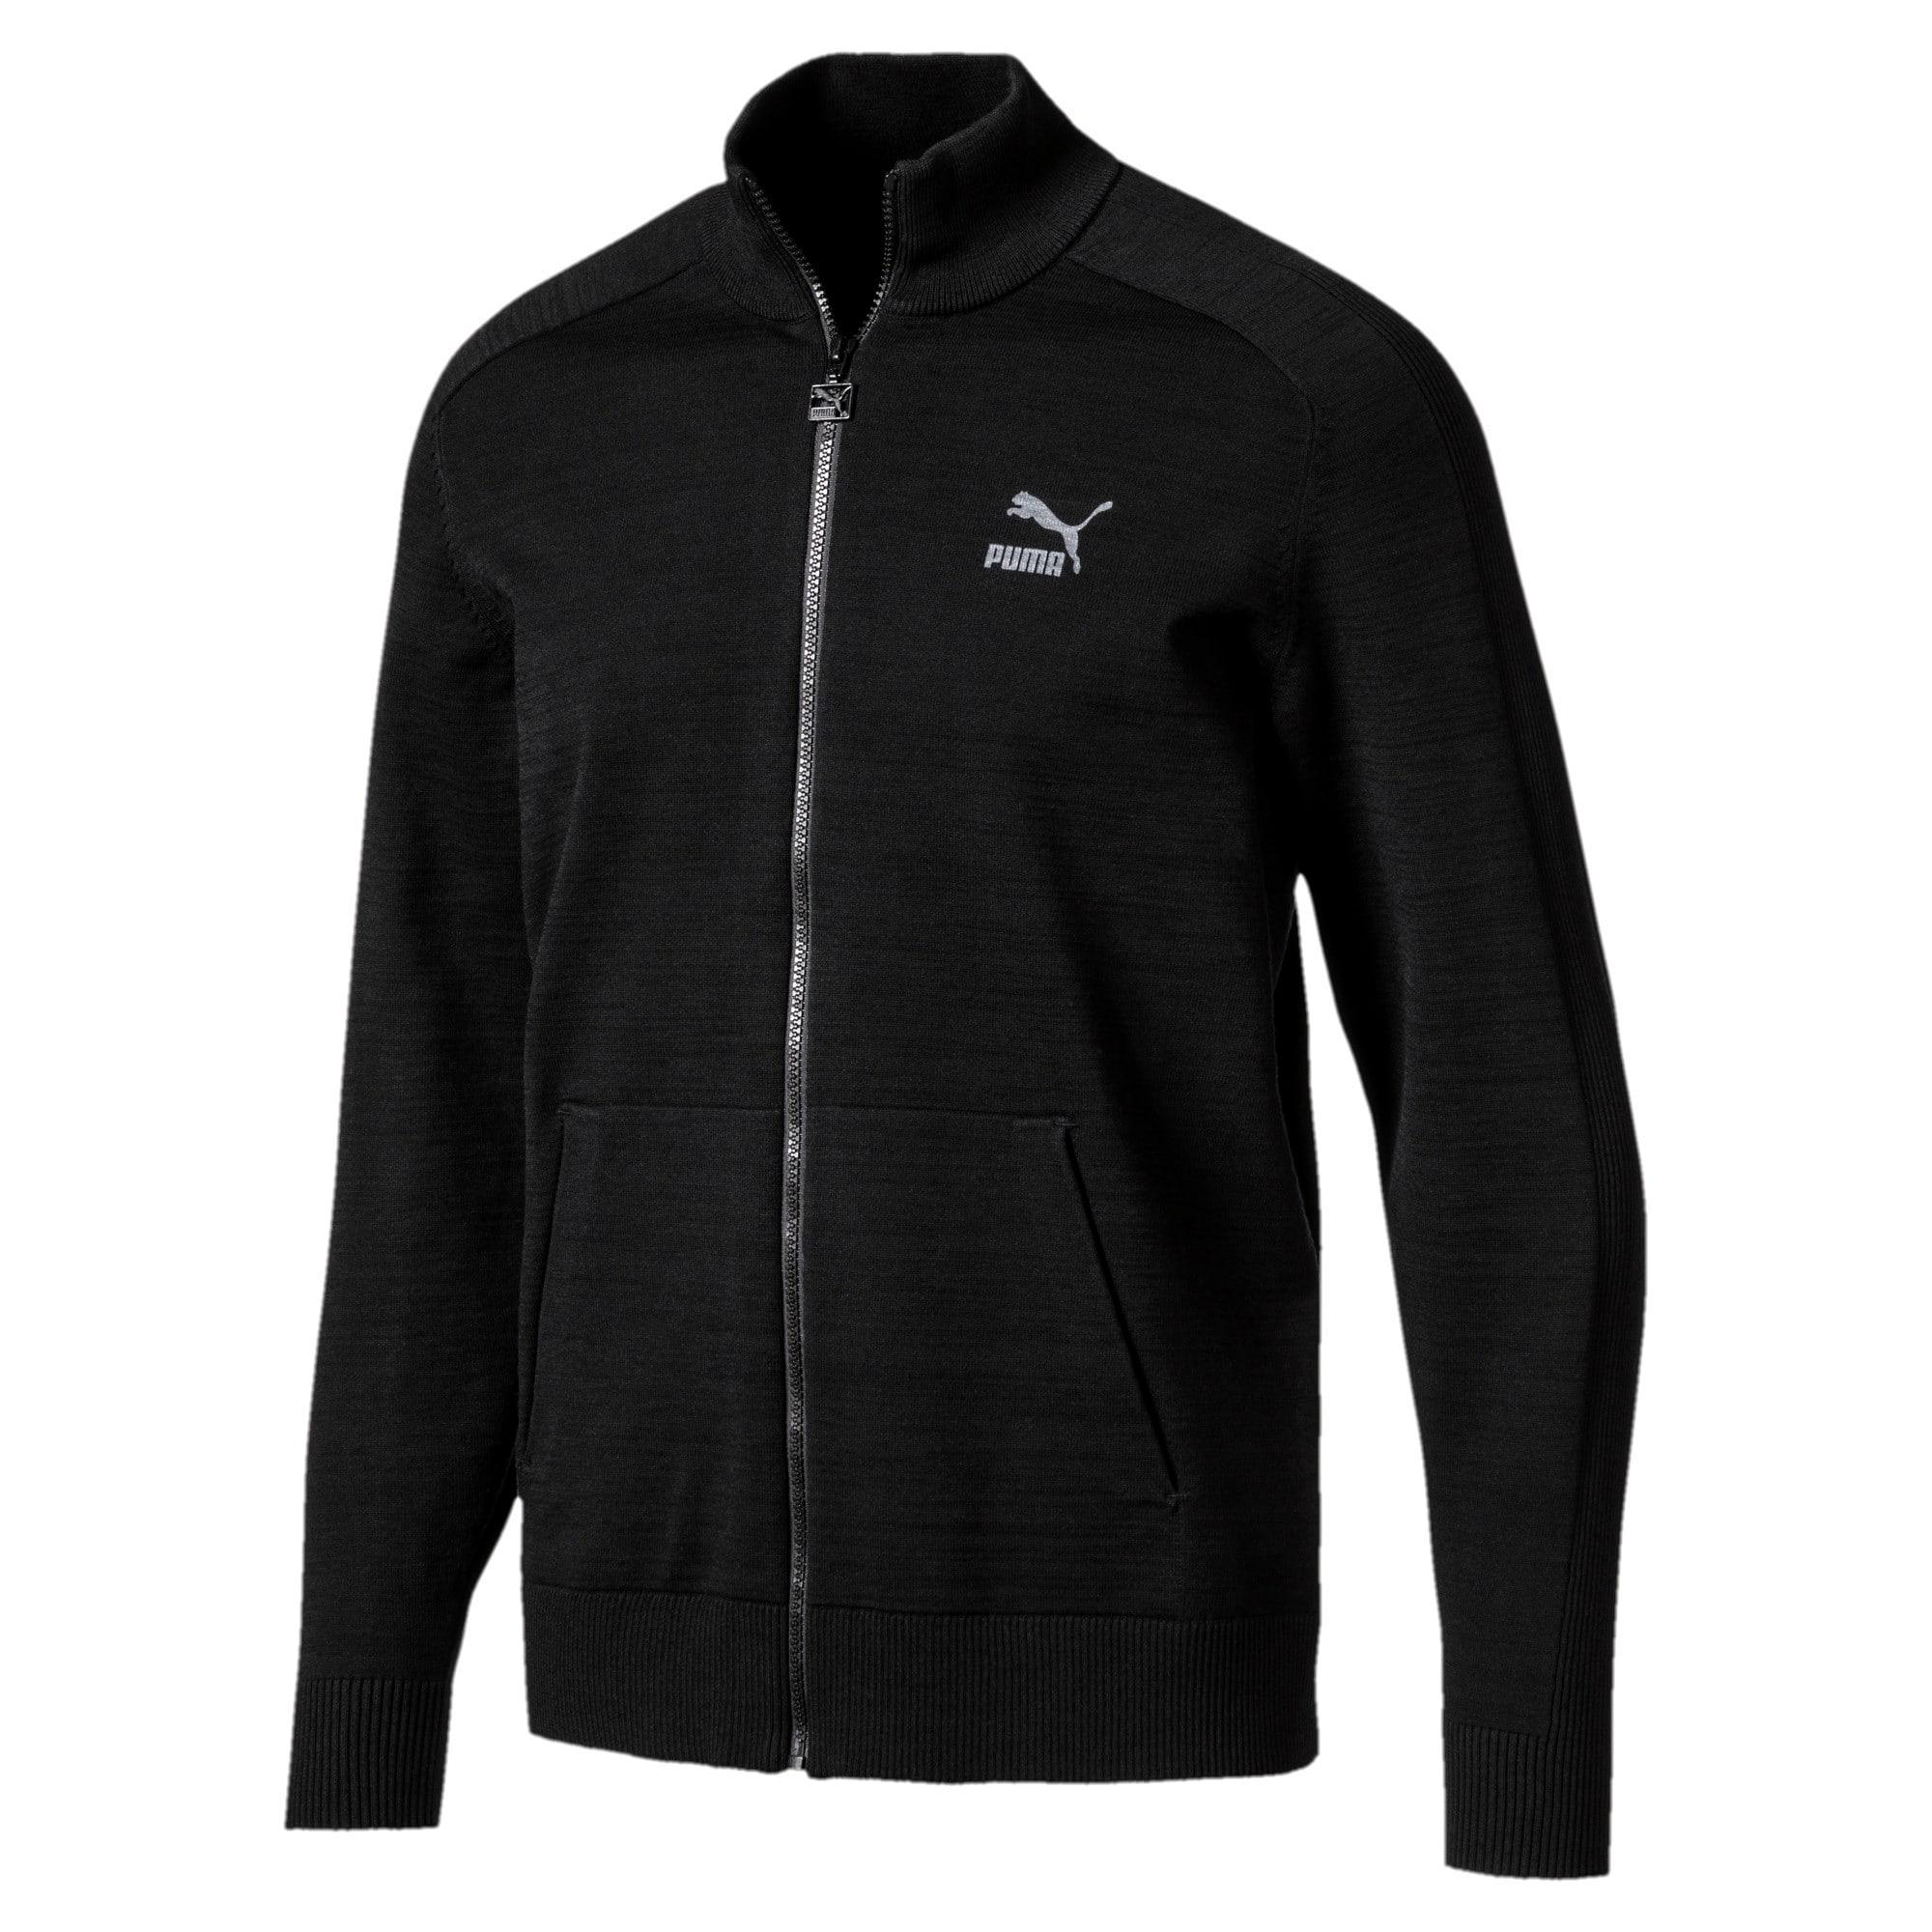 Thumbnail 2 of Men's T7 evoKnit Jacket, Puma Black, medium-IND